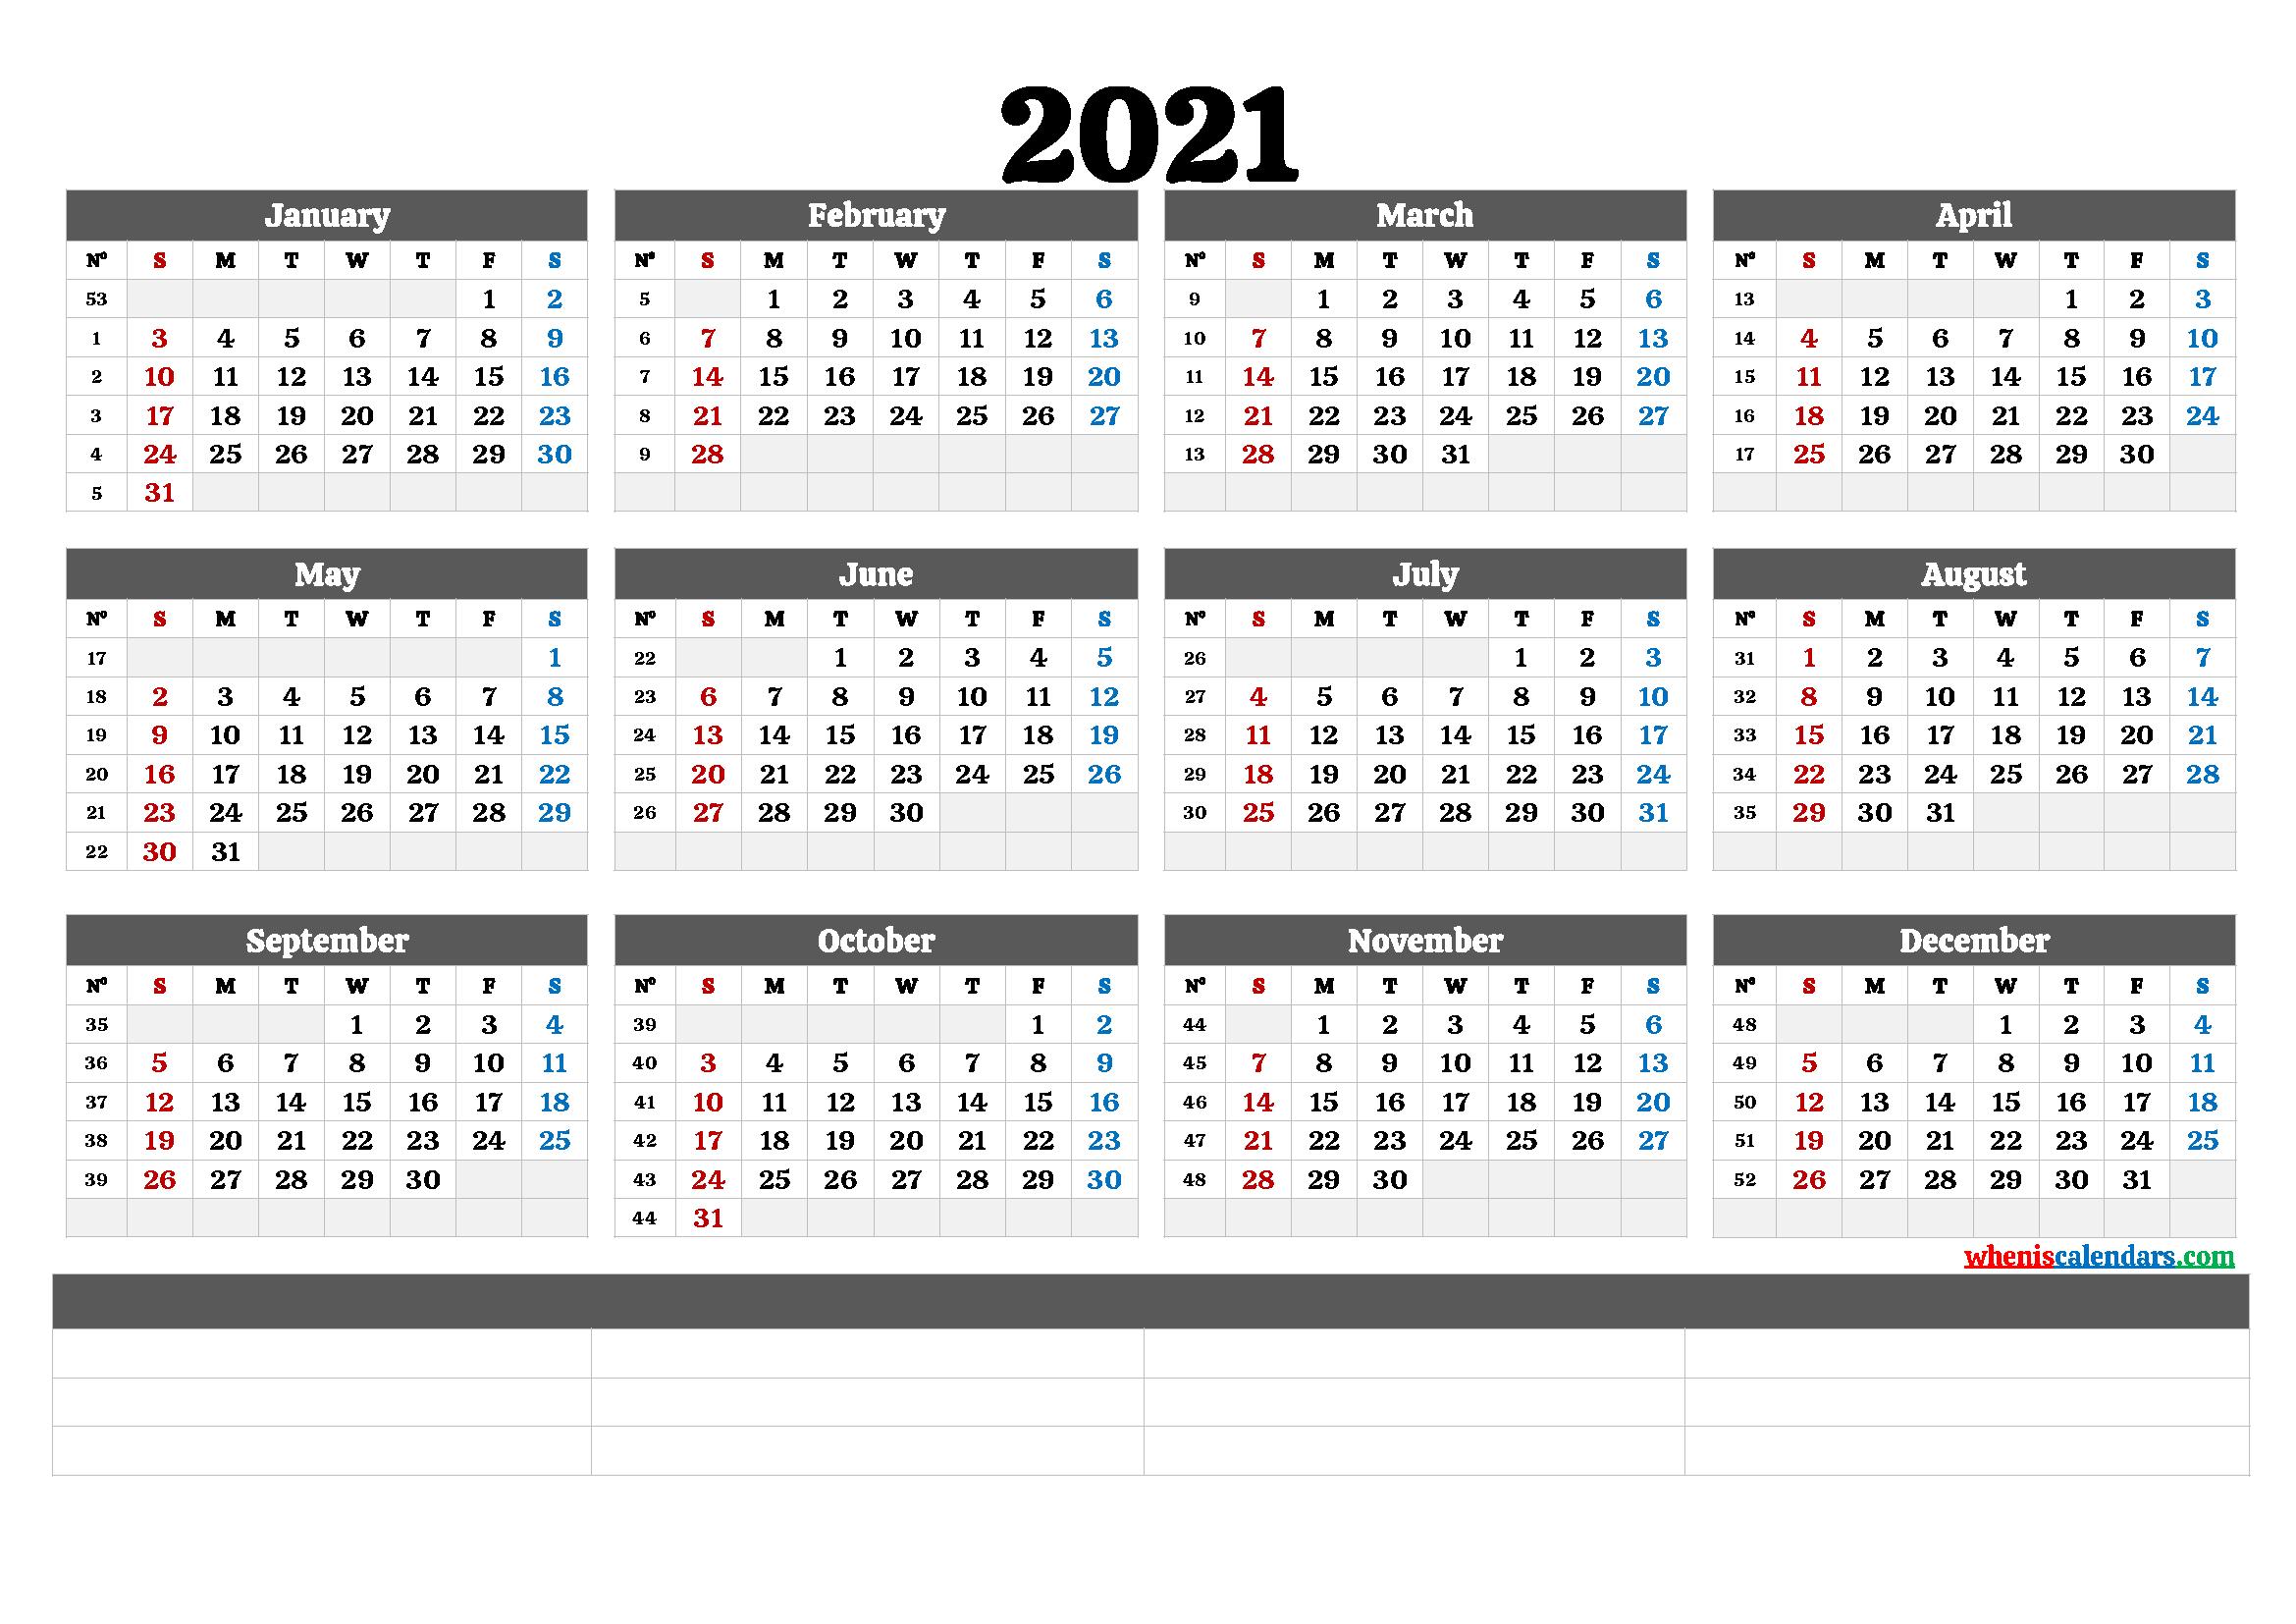 2021 Annual Calendar Printable (6 Templates)   Free